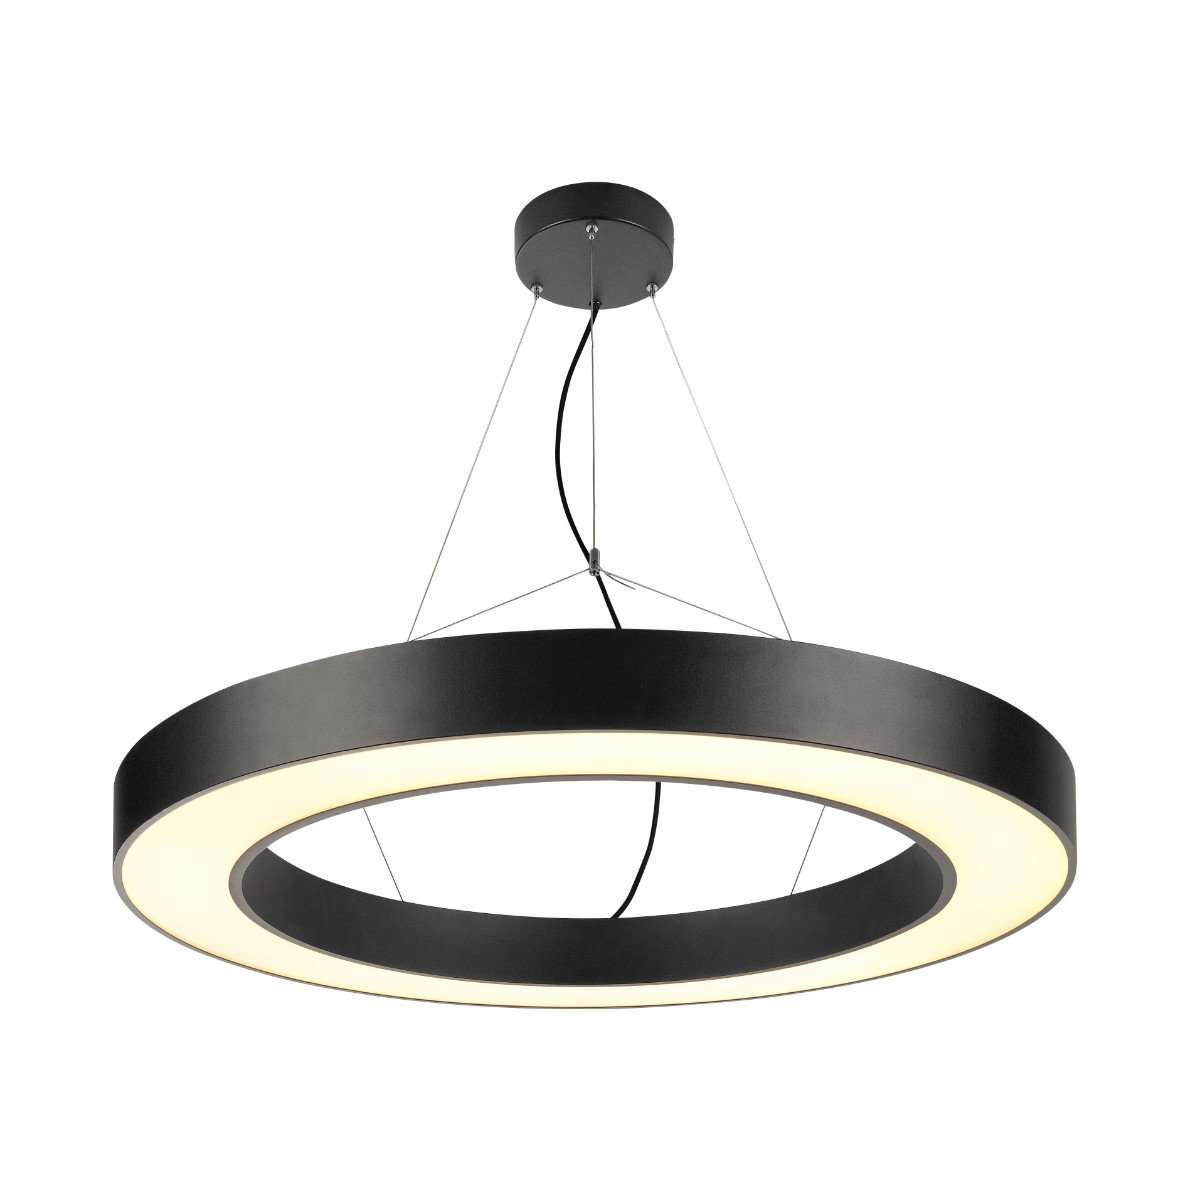 SLV - verlichting Hanglamp Medo LED SLV. 133850